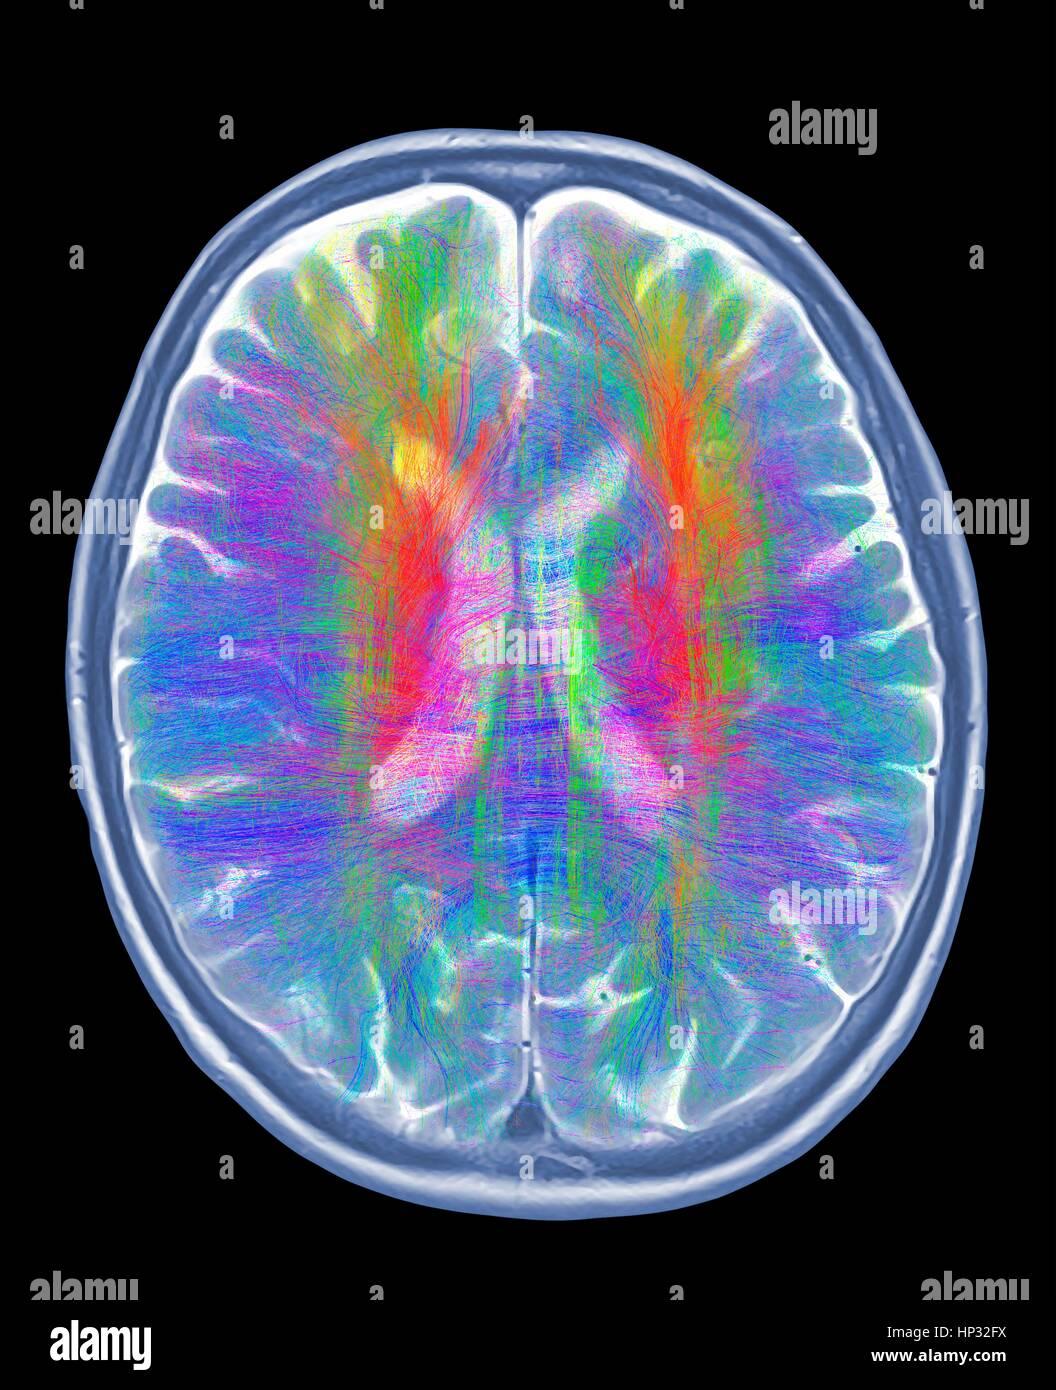 Computer Grafik MRI Draufsicht des Gehirns zeigen weißen Substanz Fasern. Farbige 3D Verbreitung spektralen Stockbild